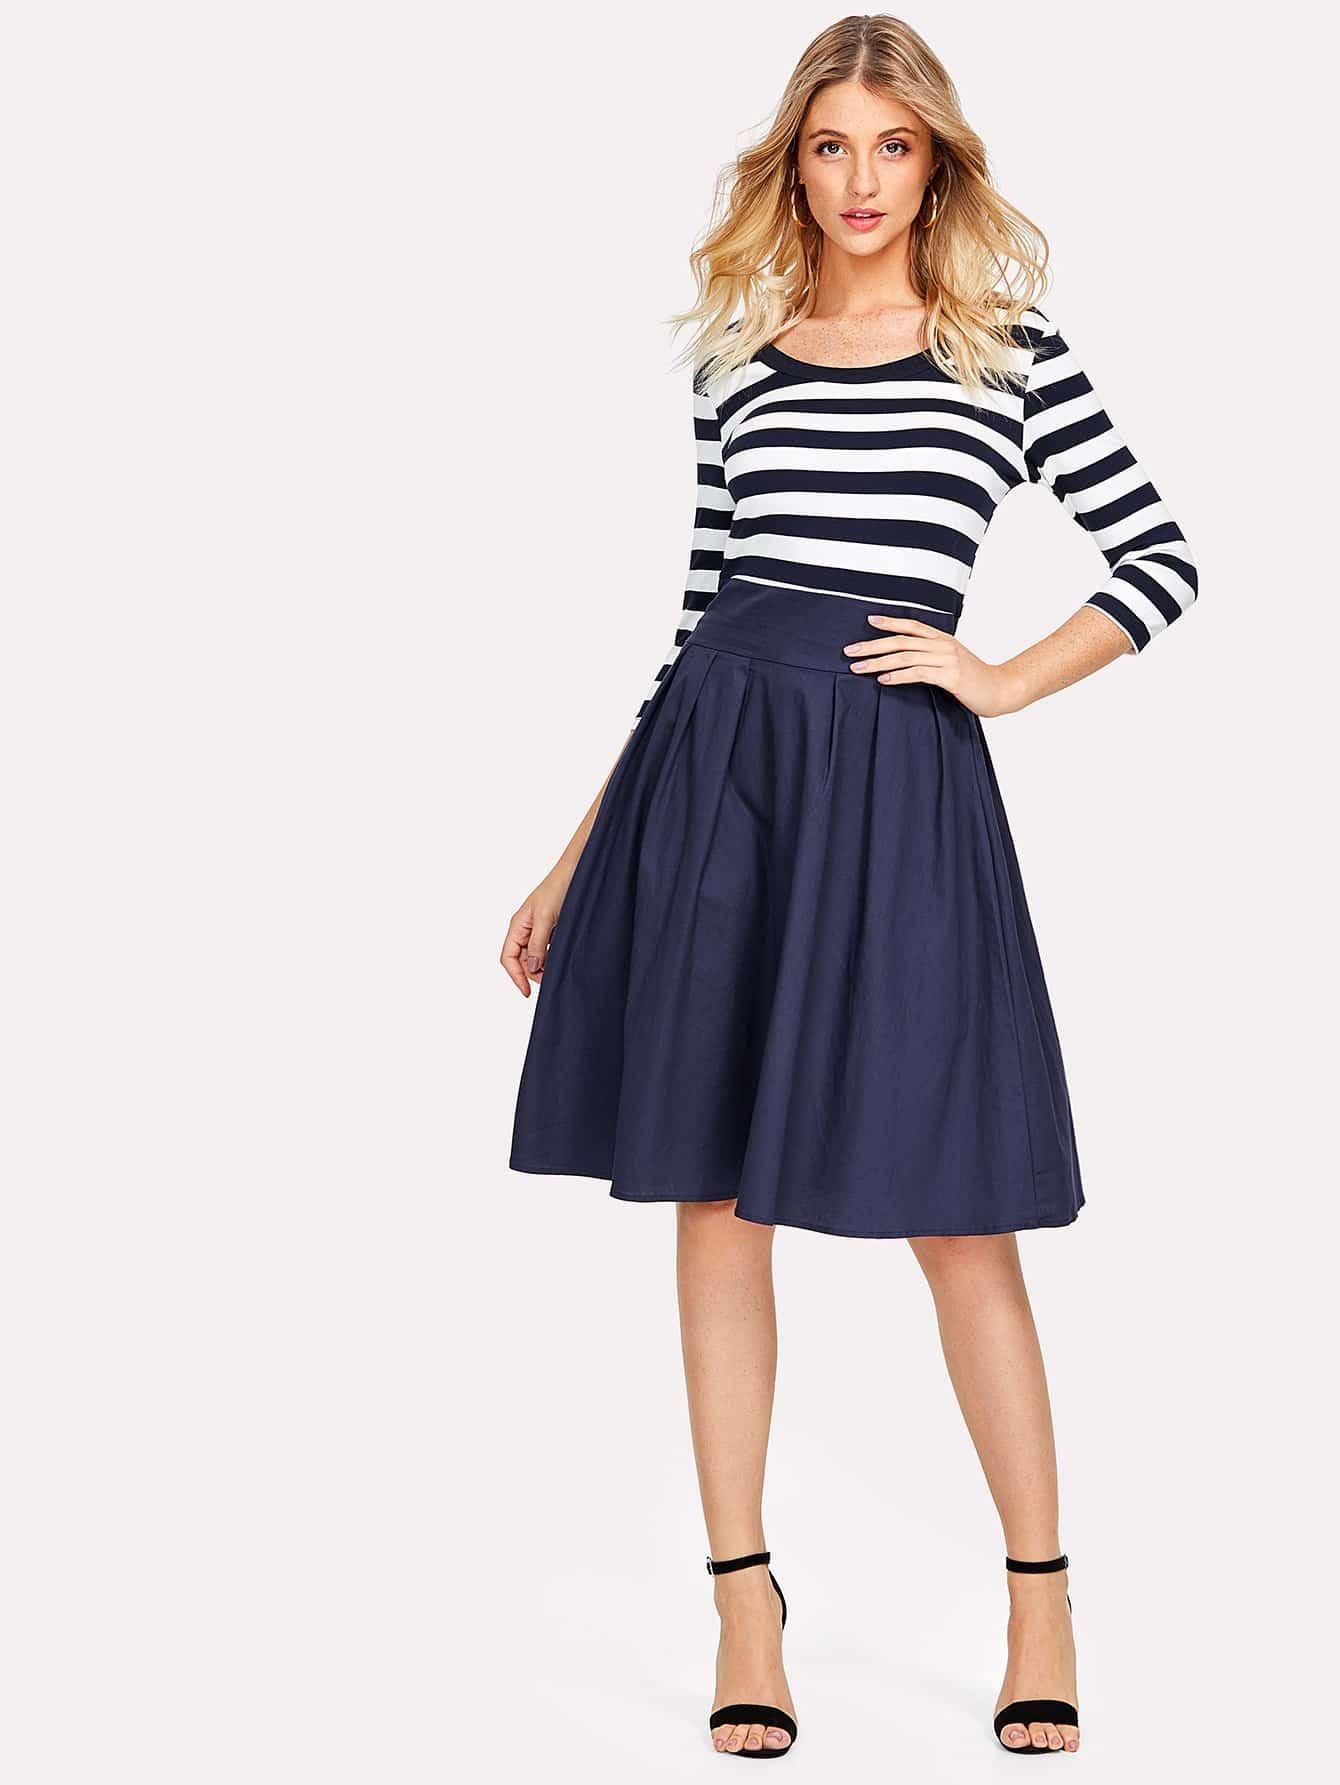 Contrast Striped Zip Up Side Dress zip up side plaid dress